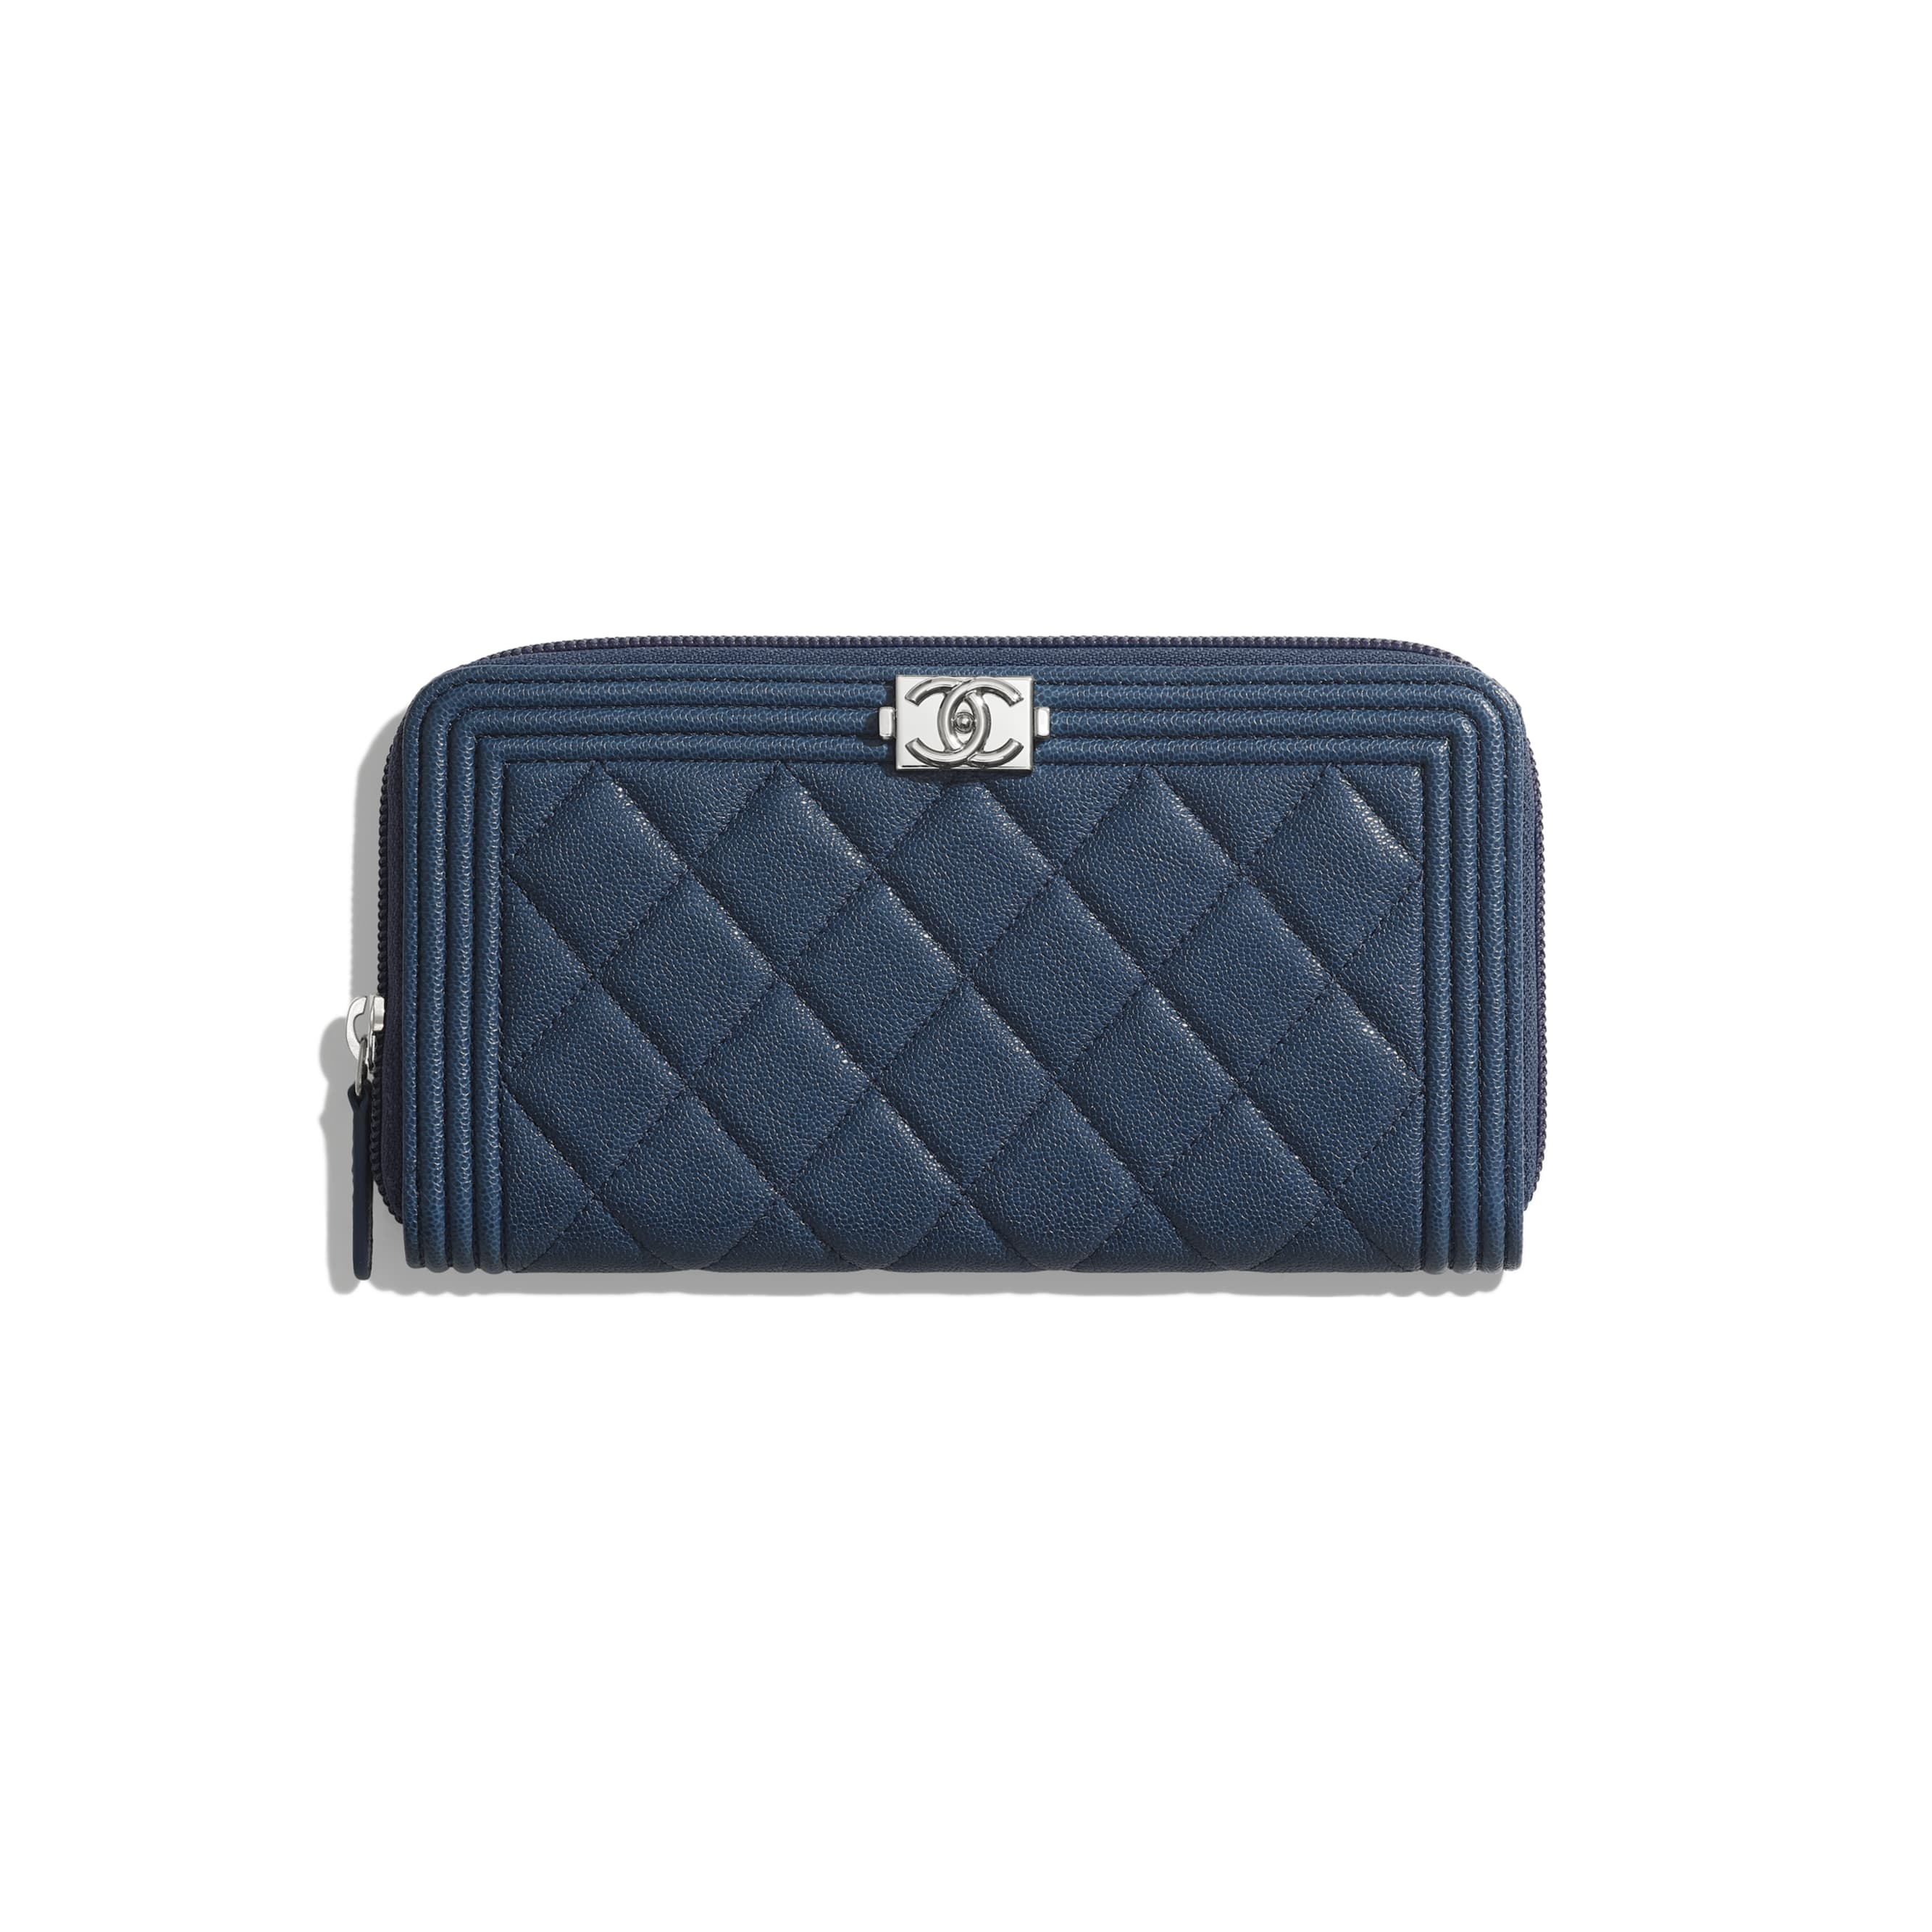 BOY CHANEL Long Zipped Wallet - Blue - Grained Calfskin & Silver Metal - Default view - see standard sized version